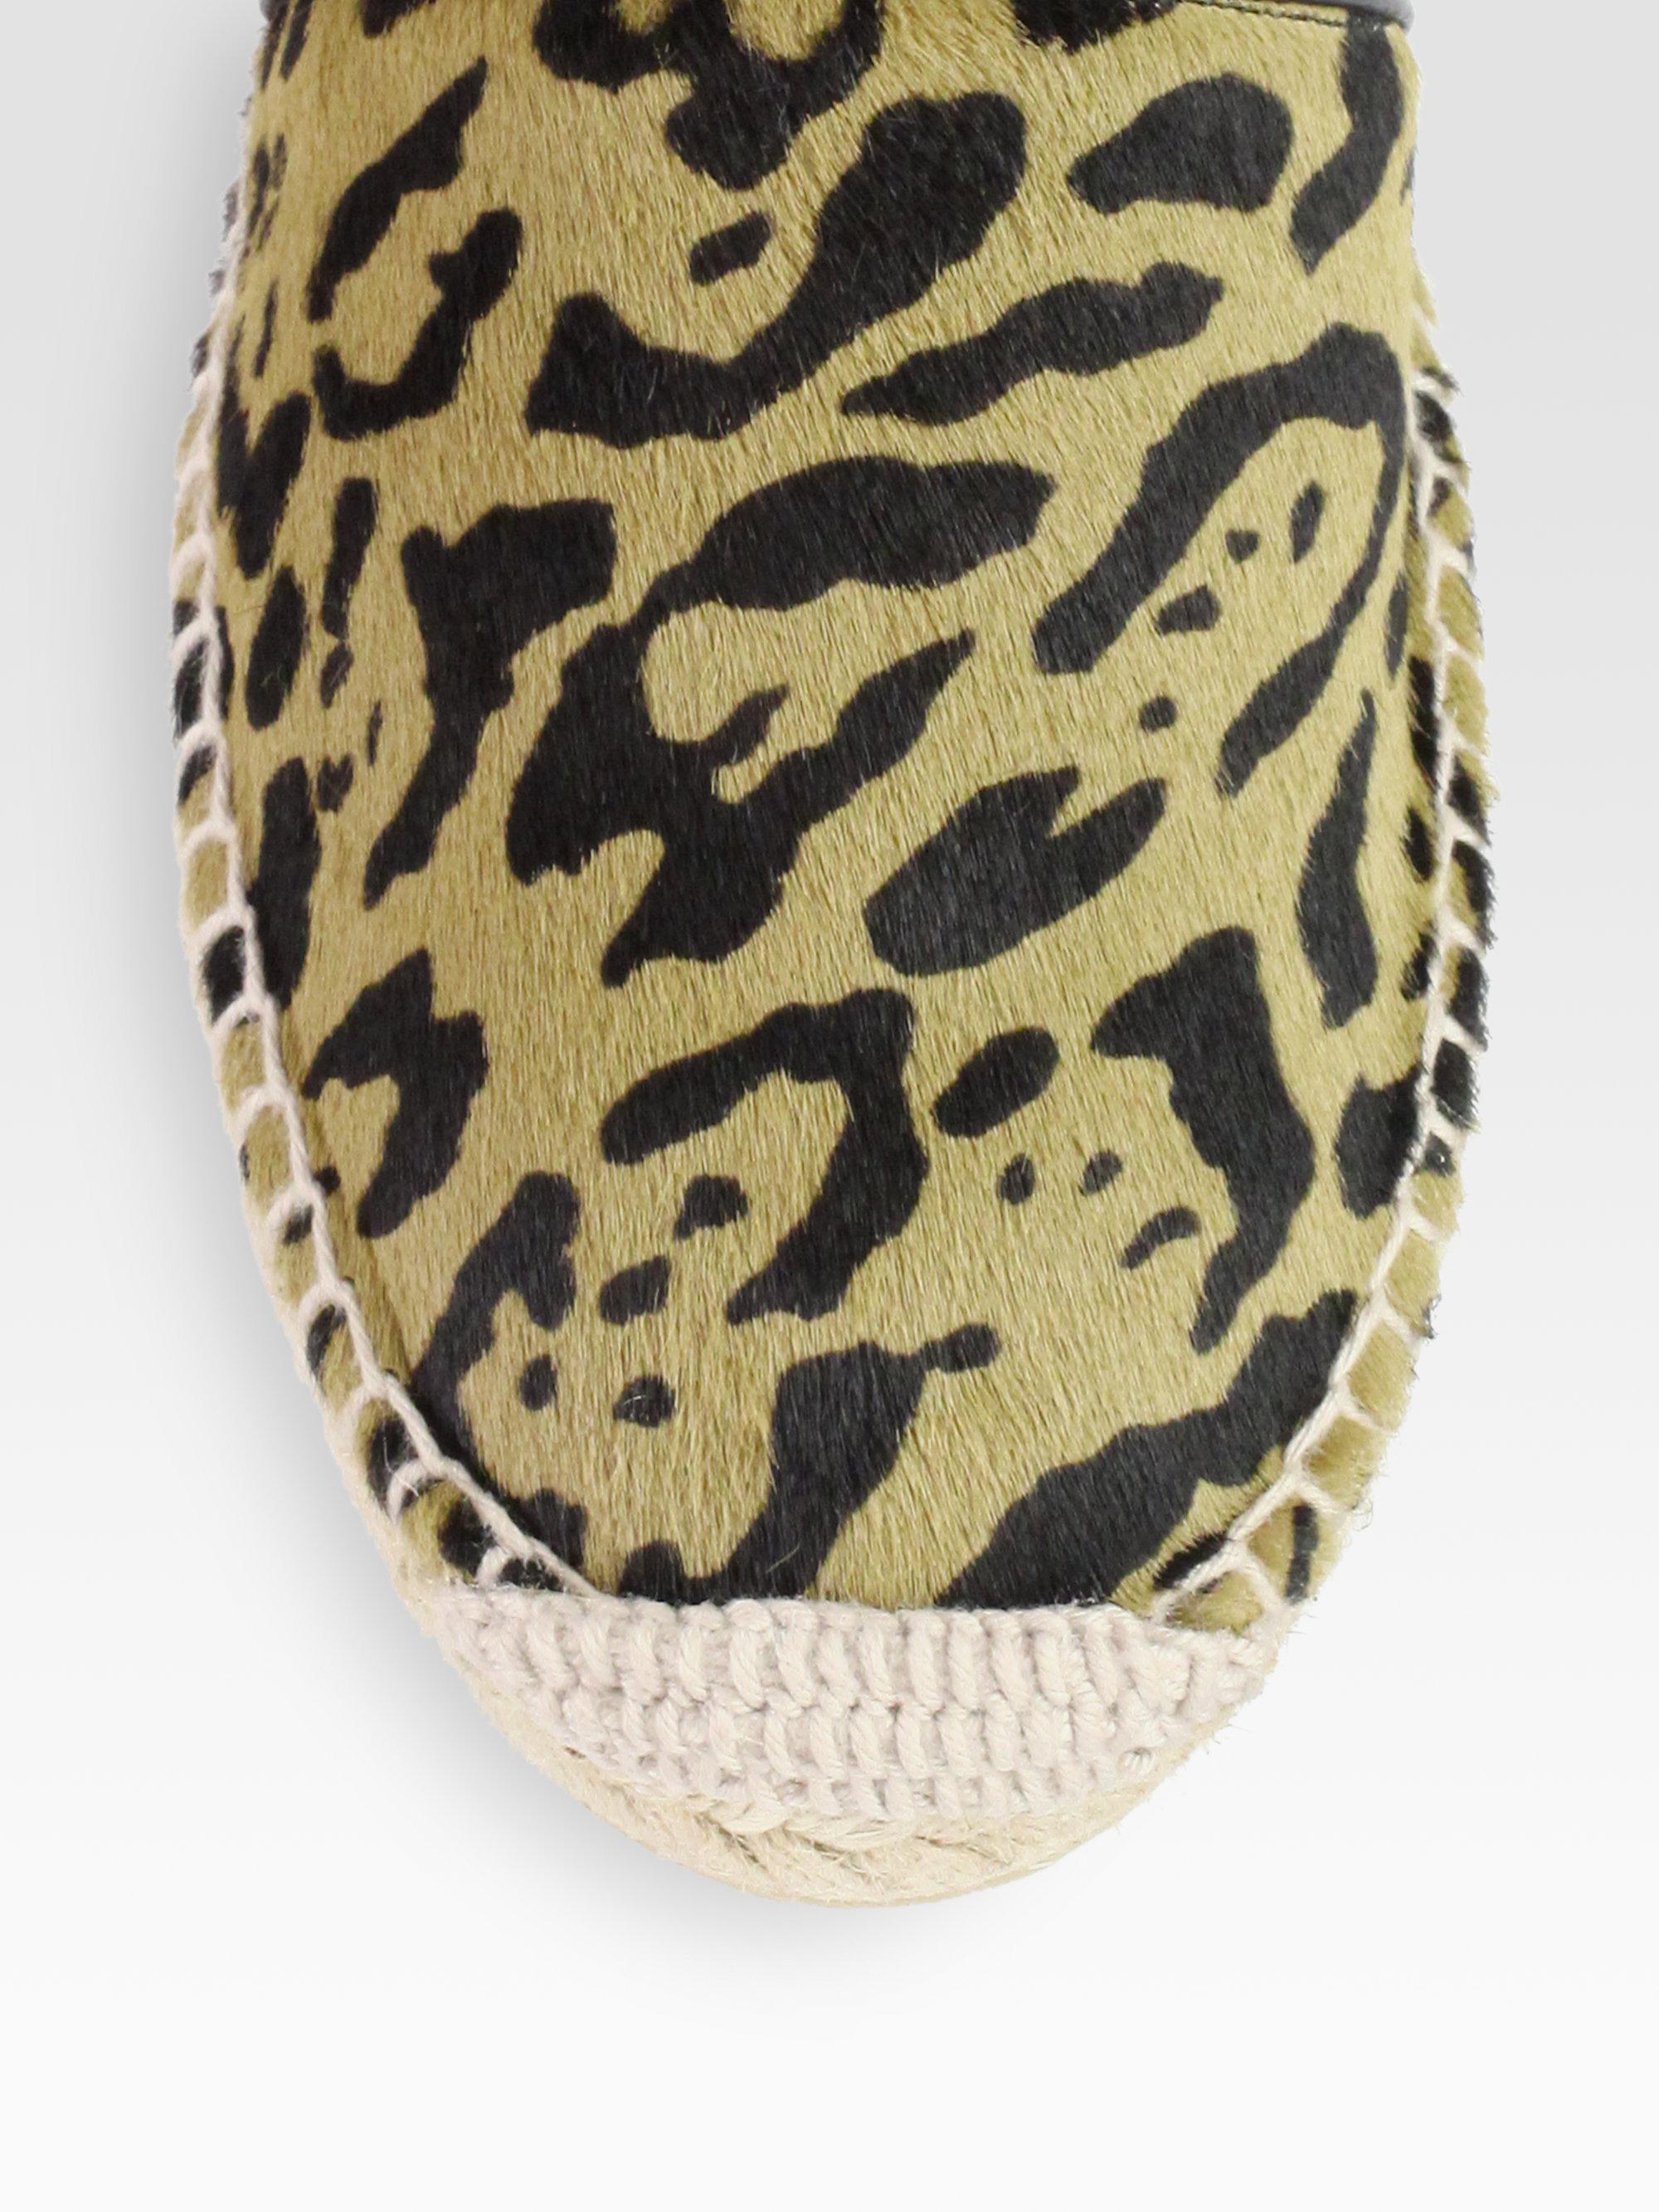 lyst jimmy choo gaine leopardprint pony hair espadrille. Black Bedroom Furniture Sets. Home Design Ideas